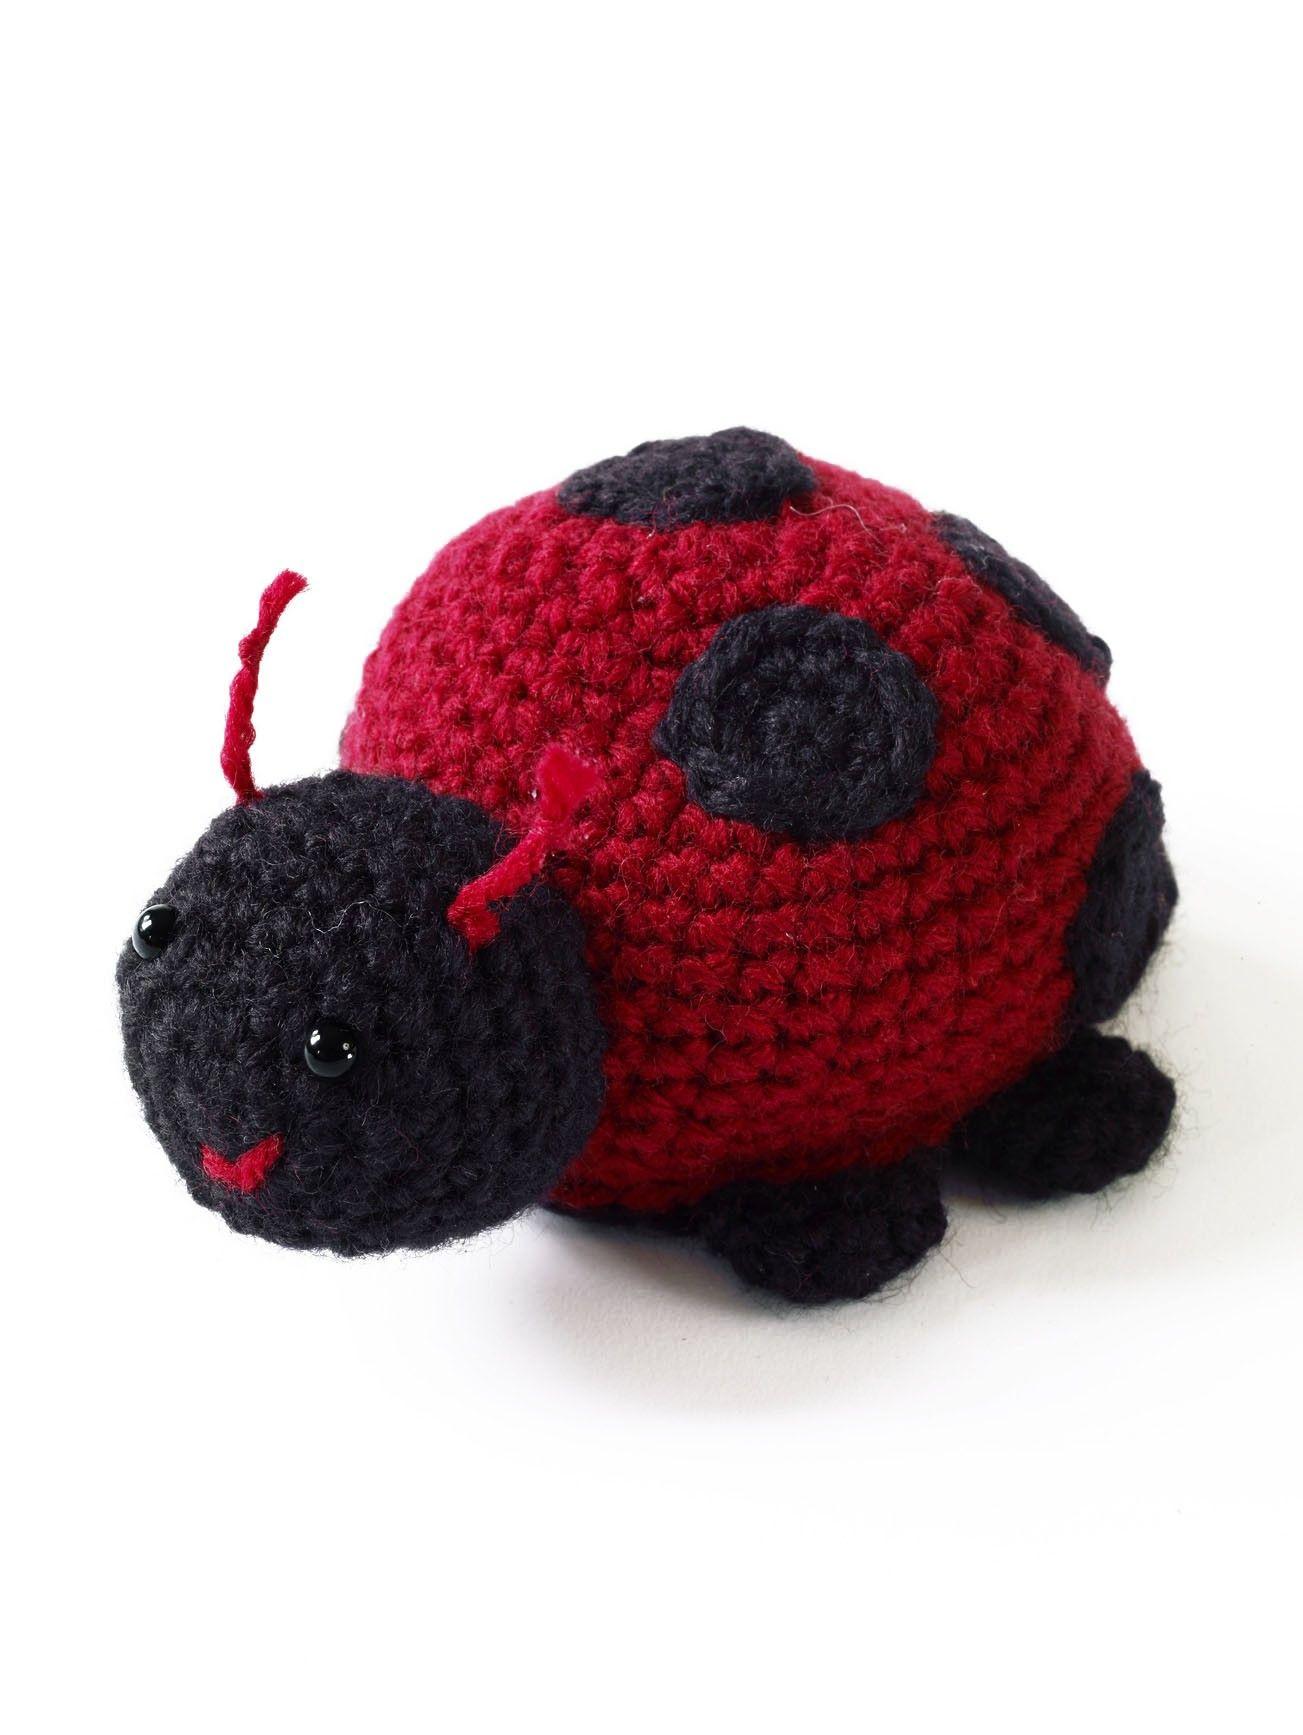 Lorelei the lady bug pattern crochet projects to try lorelei the lady bug pattern crochet bankloansurffo Choice Image